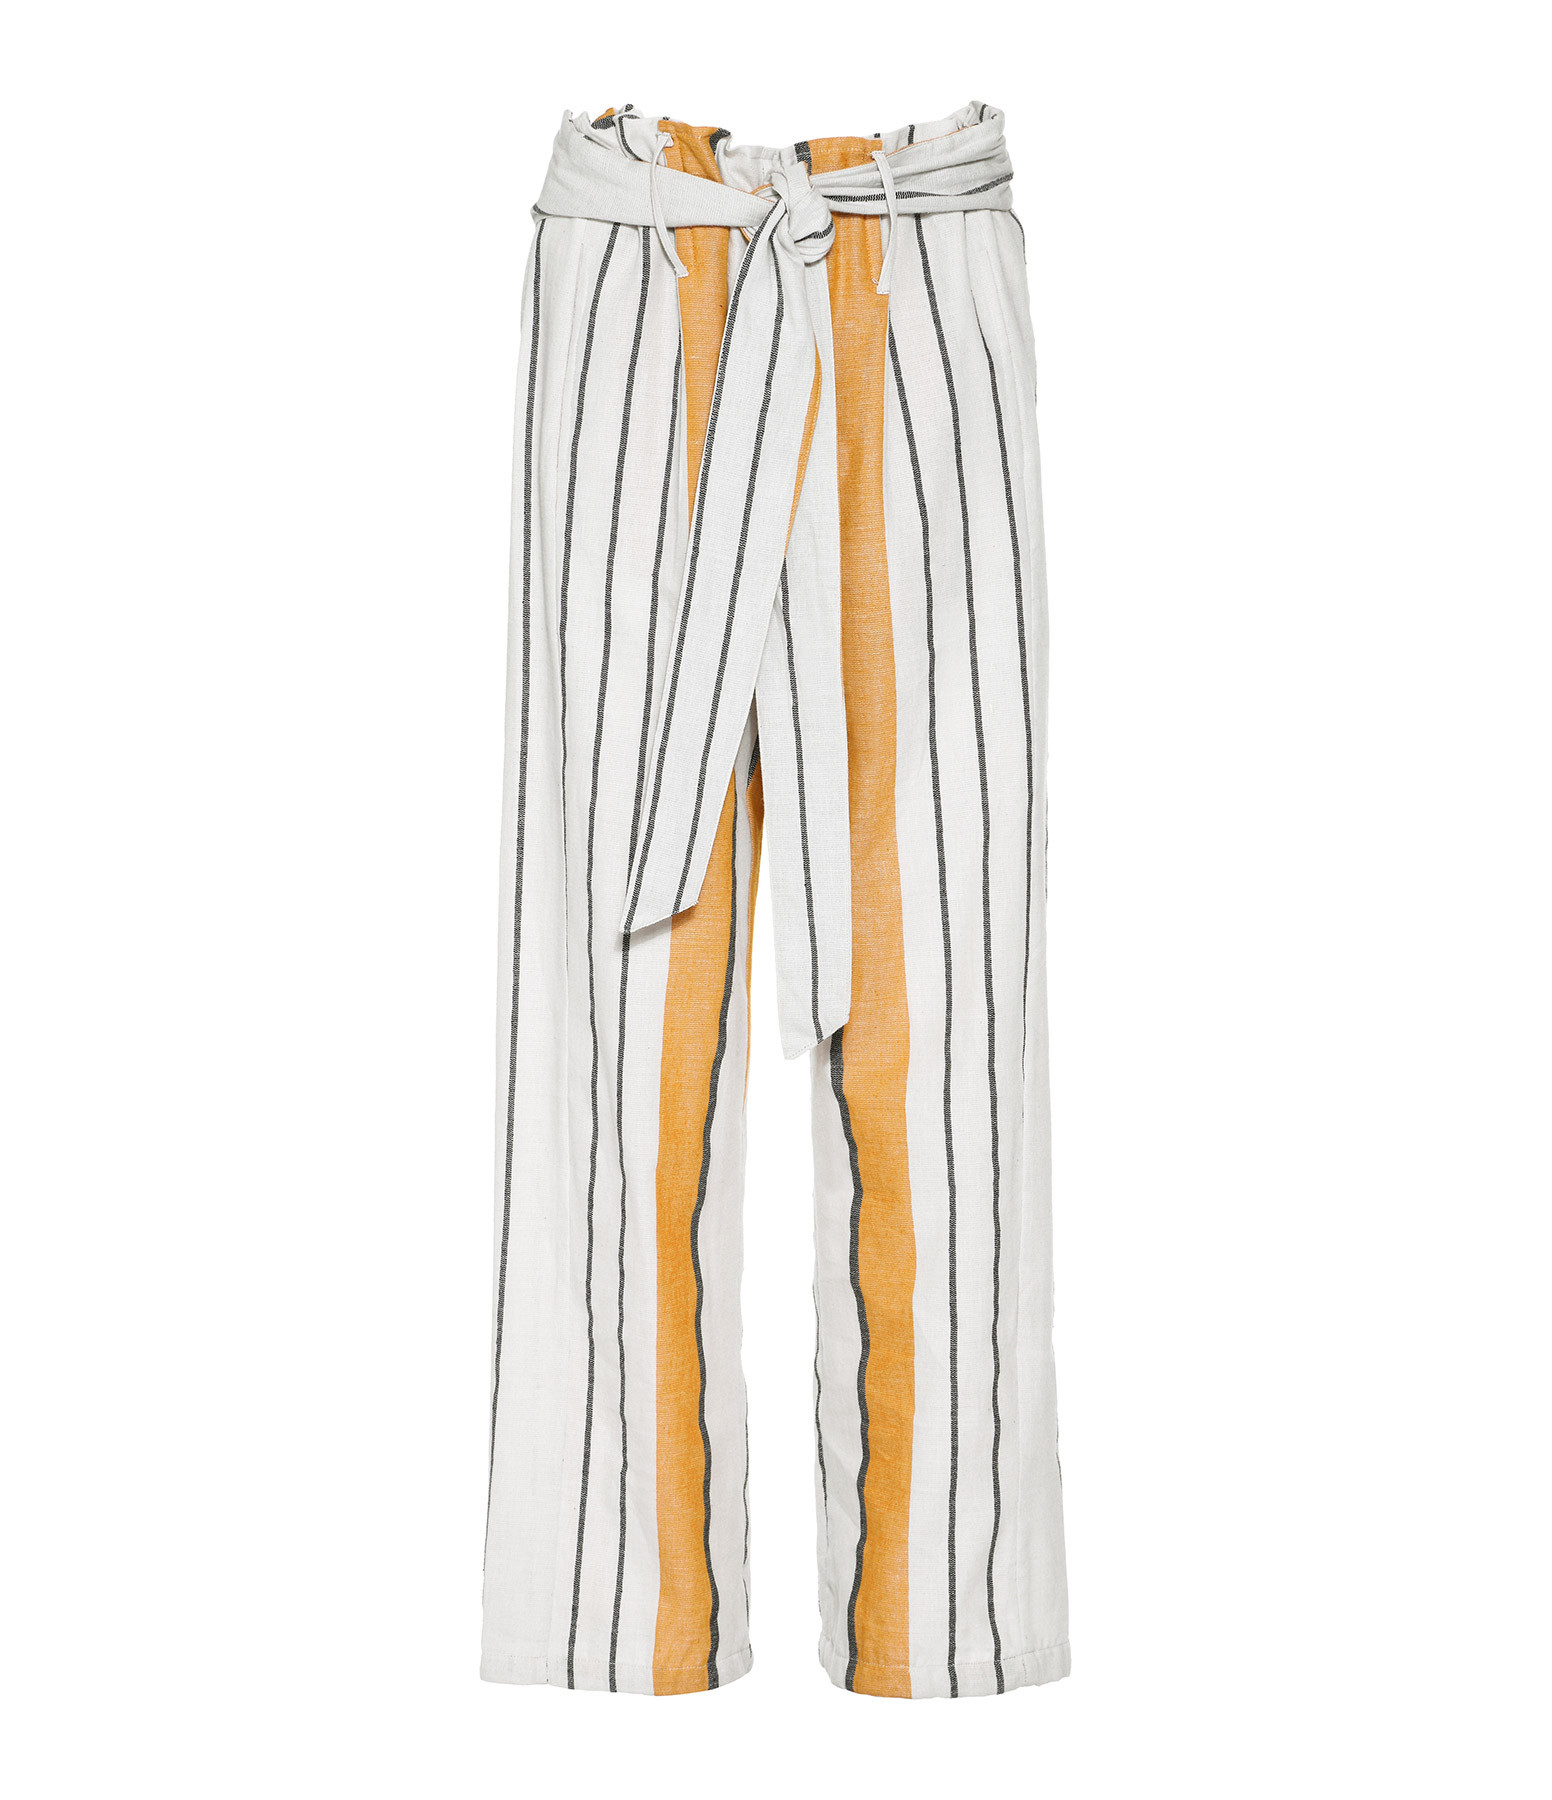 MARE DI LATTE - Pantalon Felice Arizona Rayures Jaune